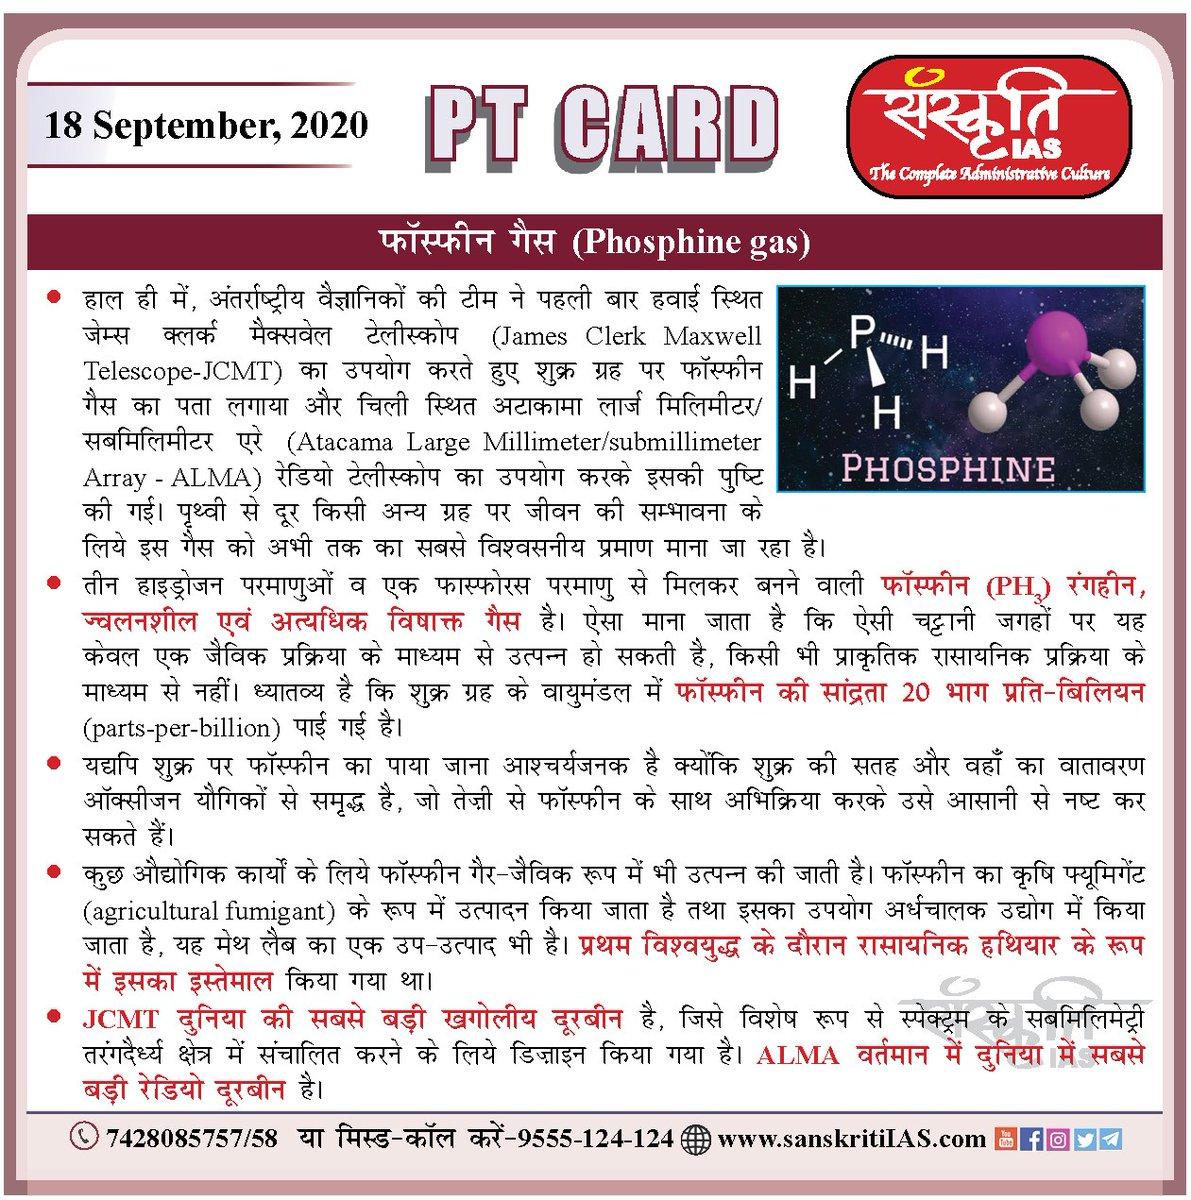 #PT_Card  फॉस्फीन गैस (Phosphine gas)  18 September 2020  https://t.co/fjZ4TiAUww  #IAS #UPSC #CivilServices #Prelims #SanskritiIAS #currentaffairs https://t.co/aO4X87sSJT